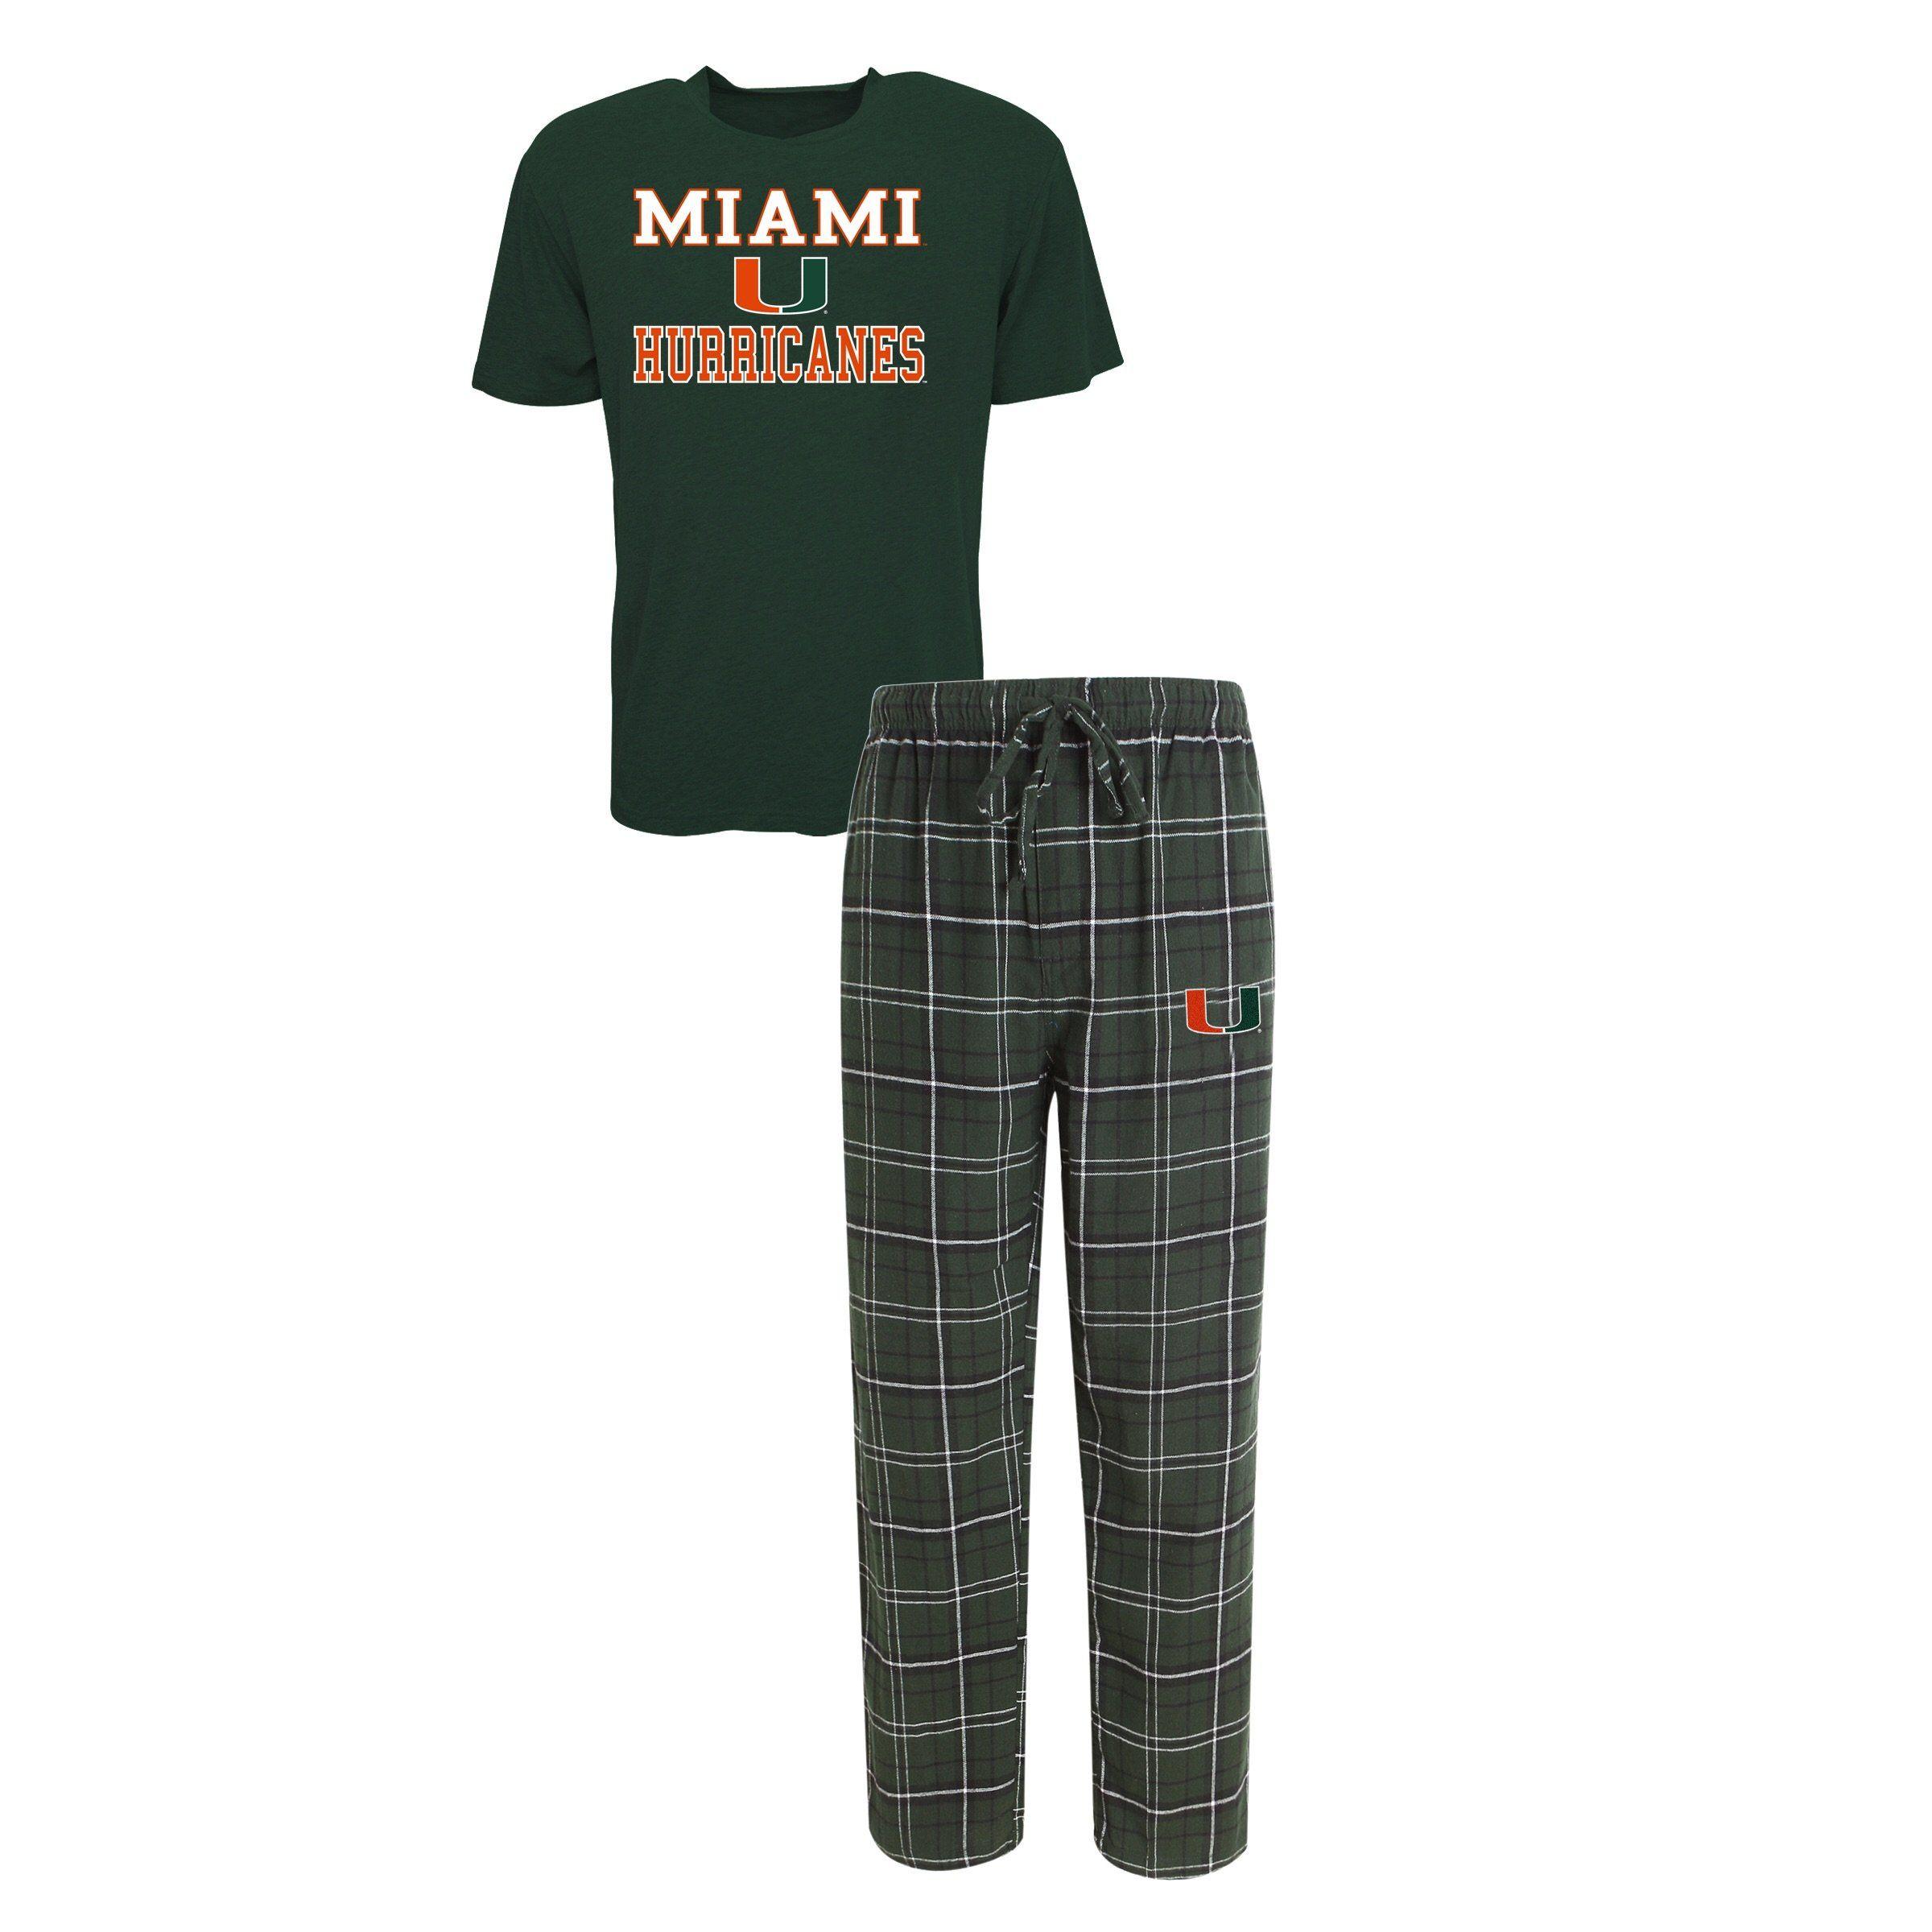 Miami Hurricanes Halftime Pajamas Shirt /& Pant Sleep Set